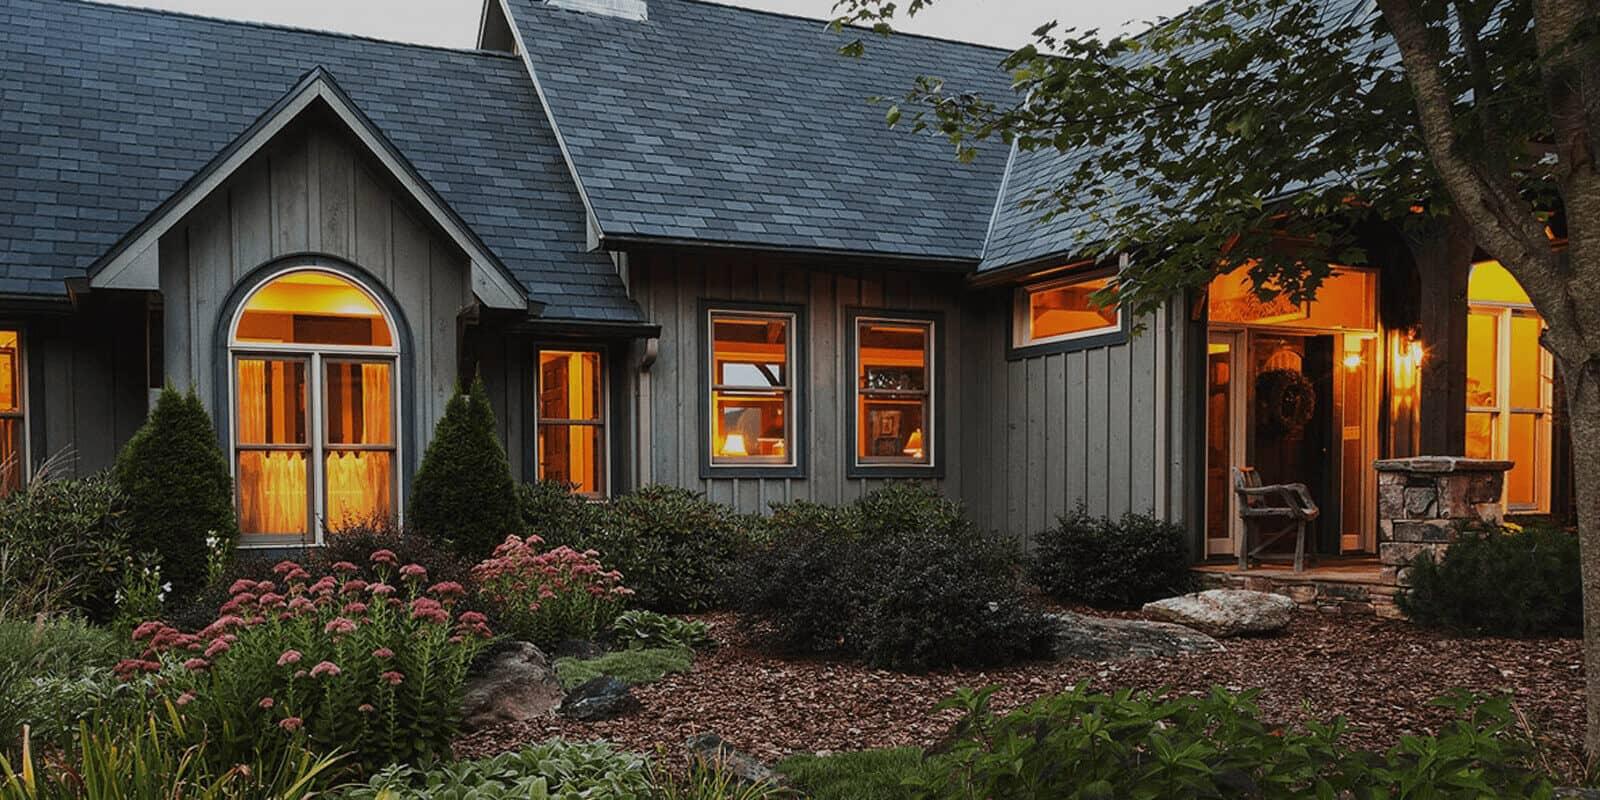 Modern home in North Carolina